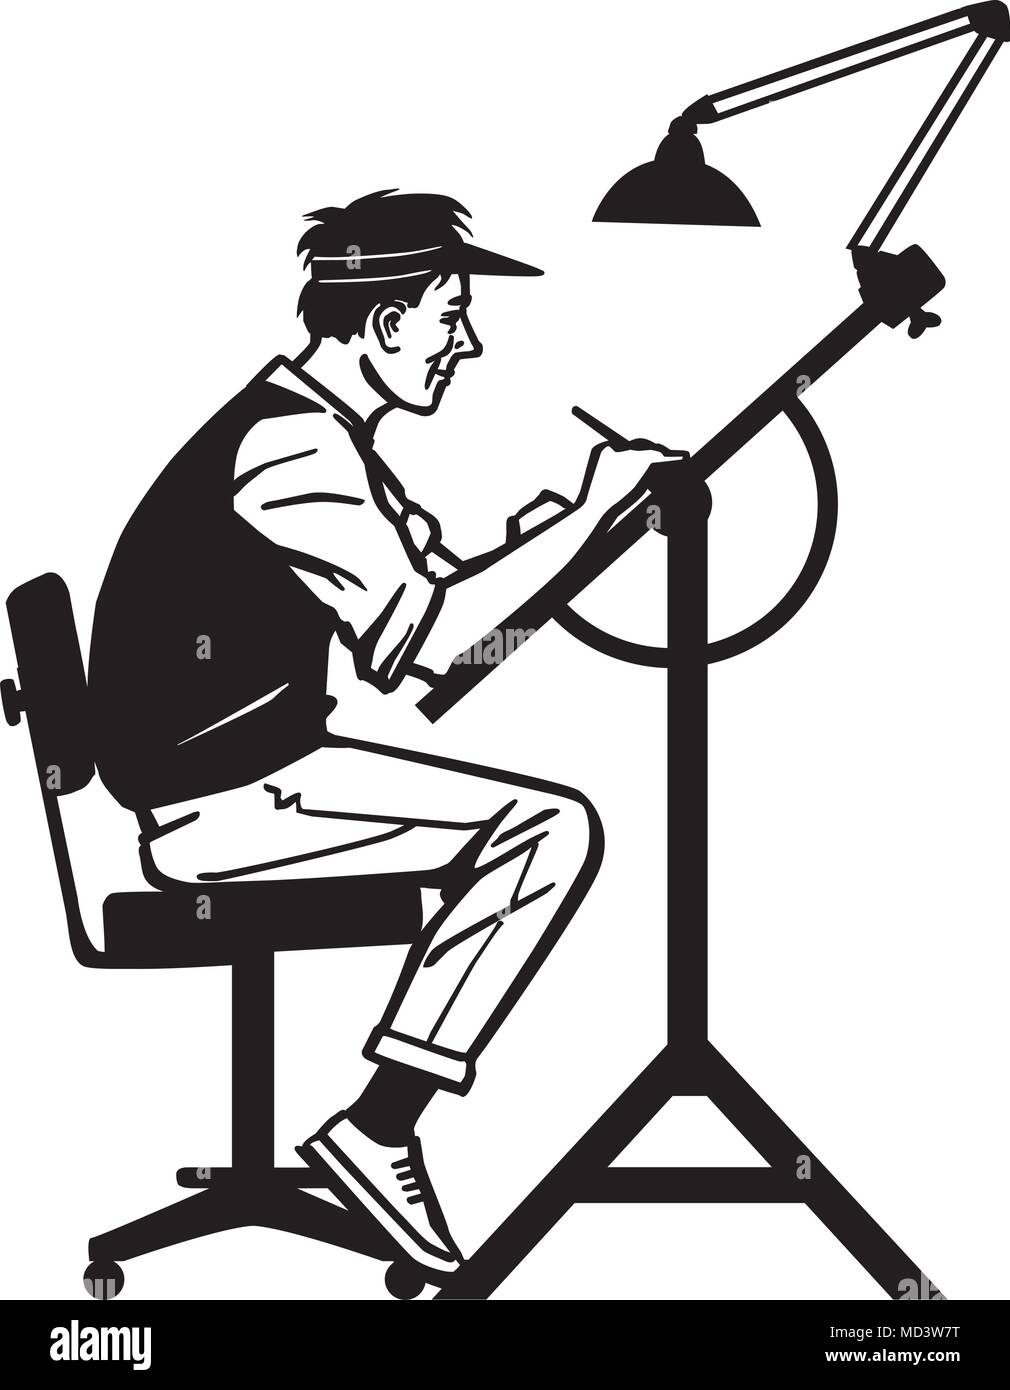 Künstler Bei Der Arbeit Retro Clipart Illustration Vektor